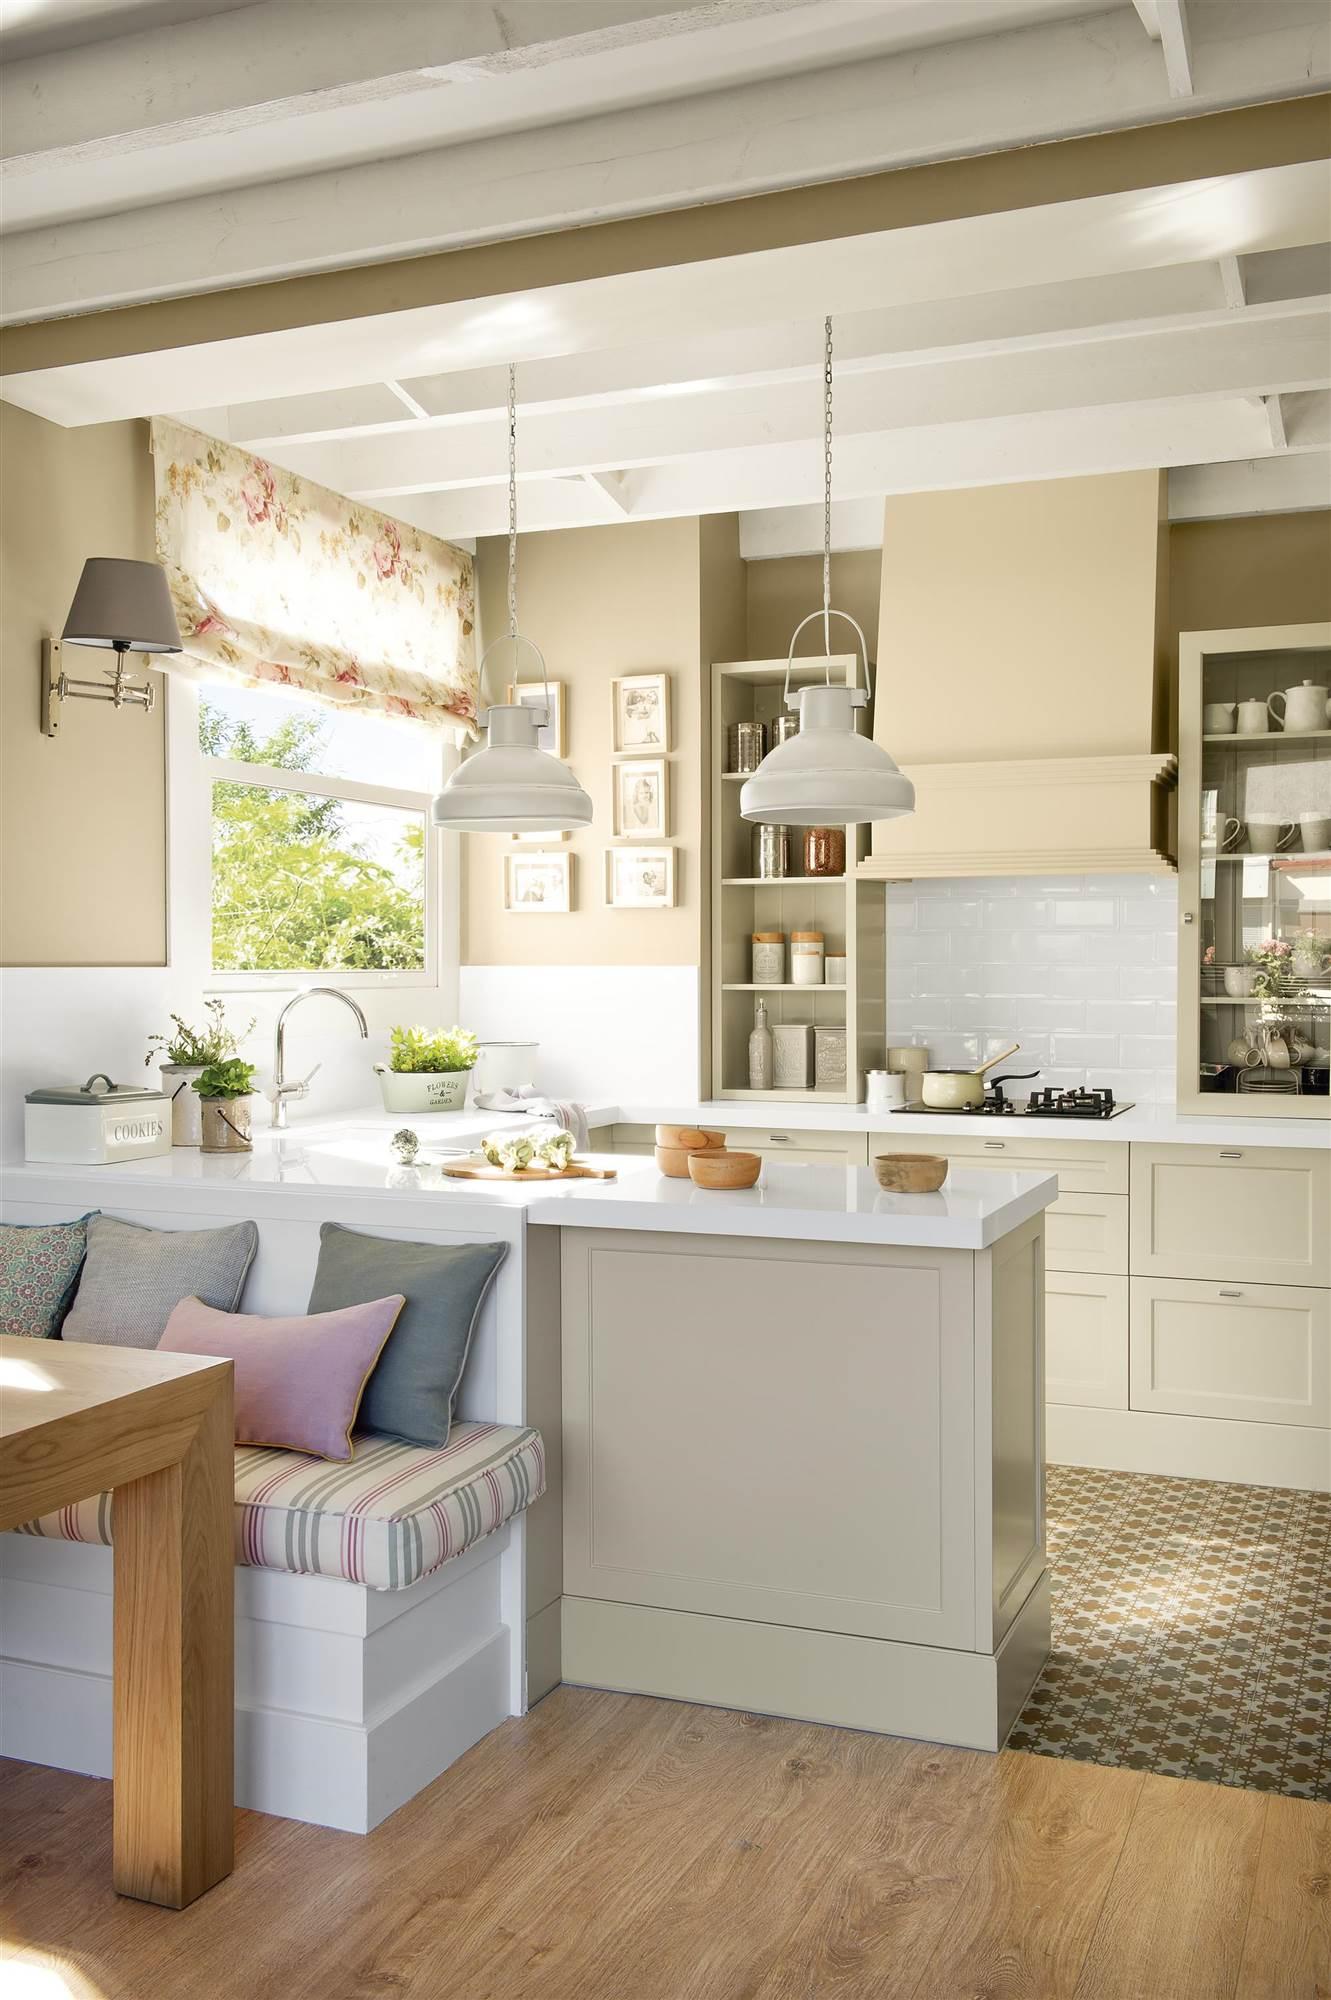 Bonito Muebles De Cocina Manchados Con Suelos Oscuros Viñeta - Ideas ...